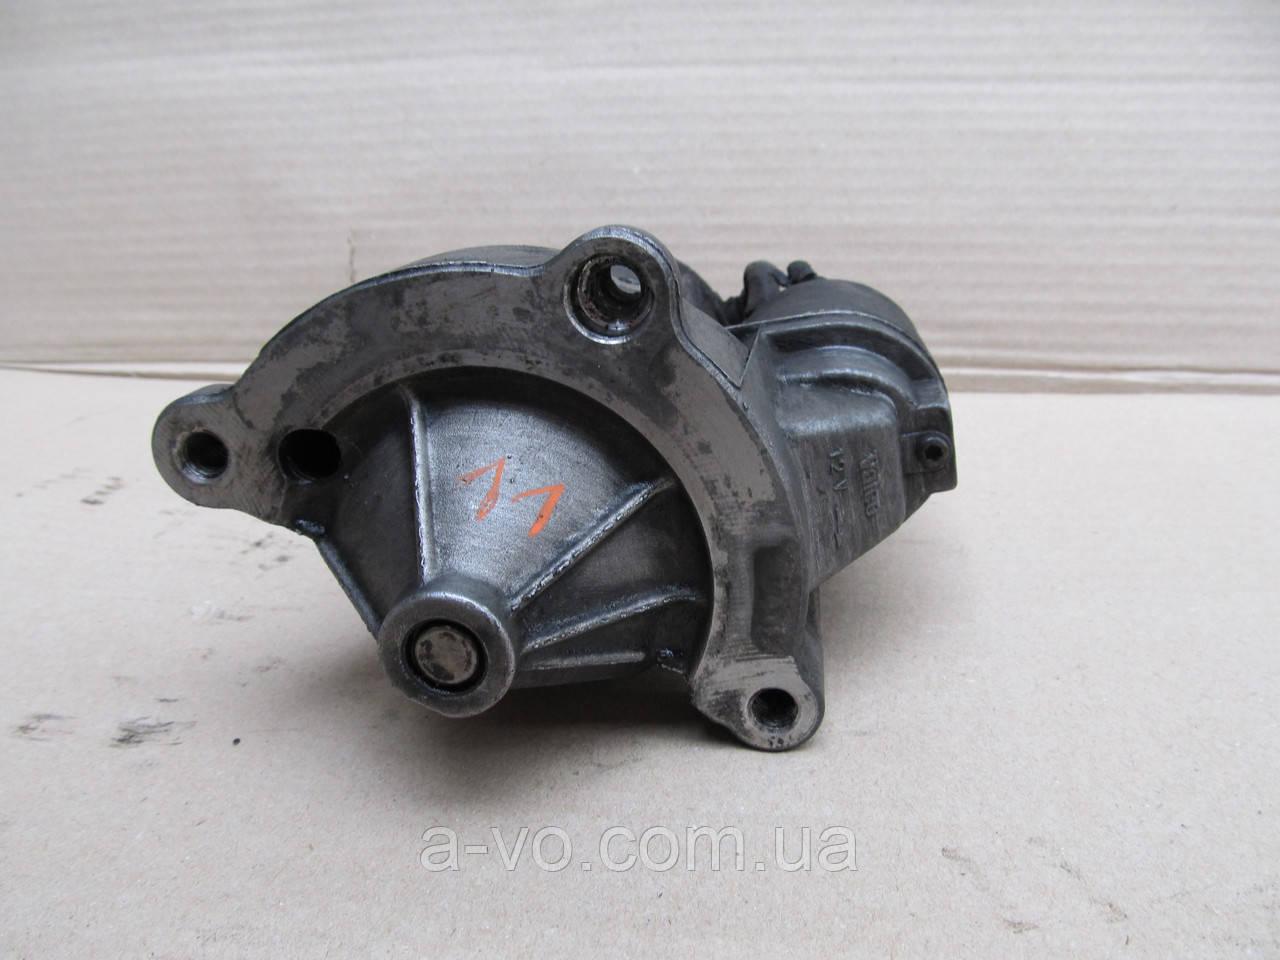 Стартер для Peugeot 205 305 306 307 407 Boxer Expert 1.9 2.0HDi D7R26